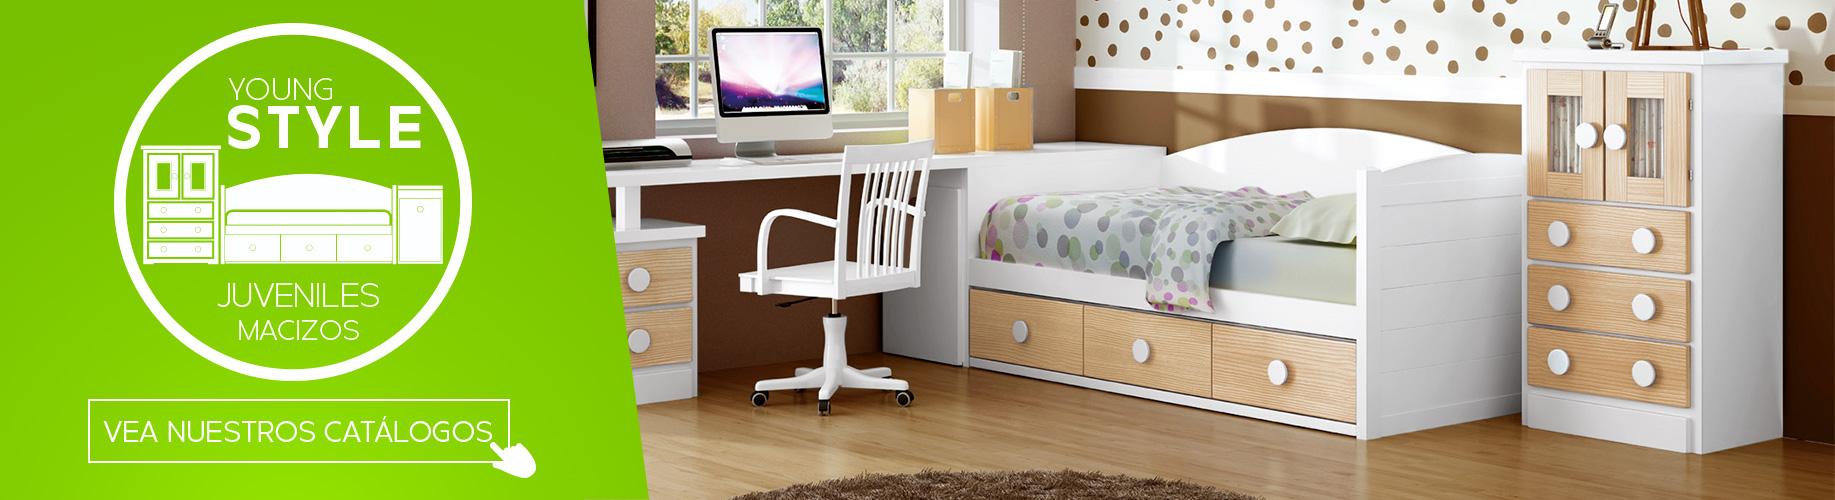 Muebles juveniles macizos